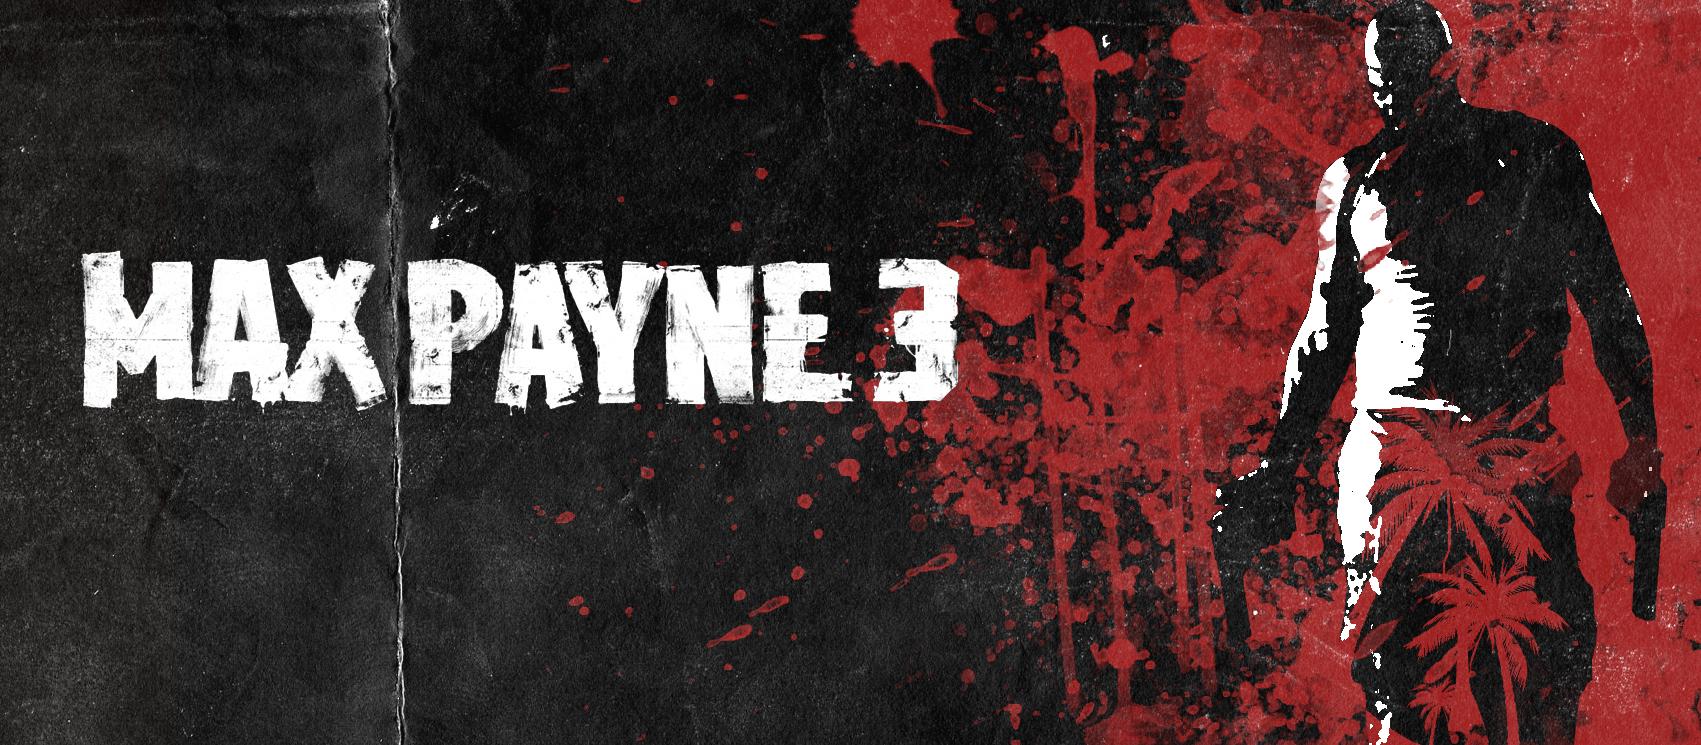 Max Payne 3 Banner By Jackoozy On Deviantart